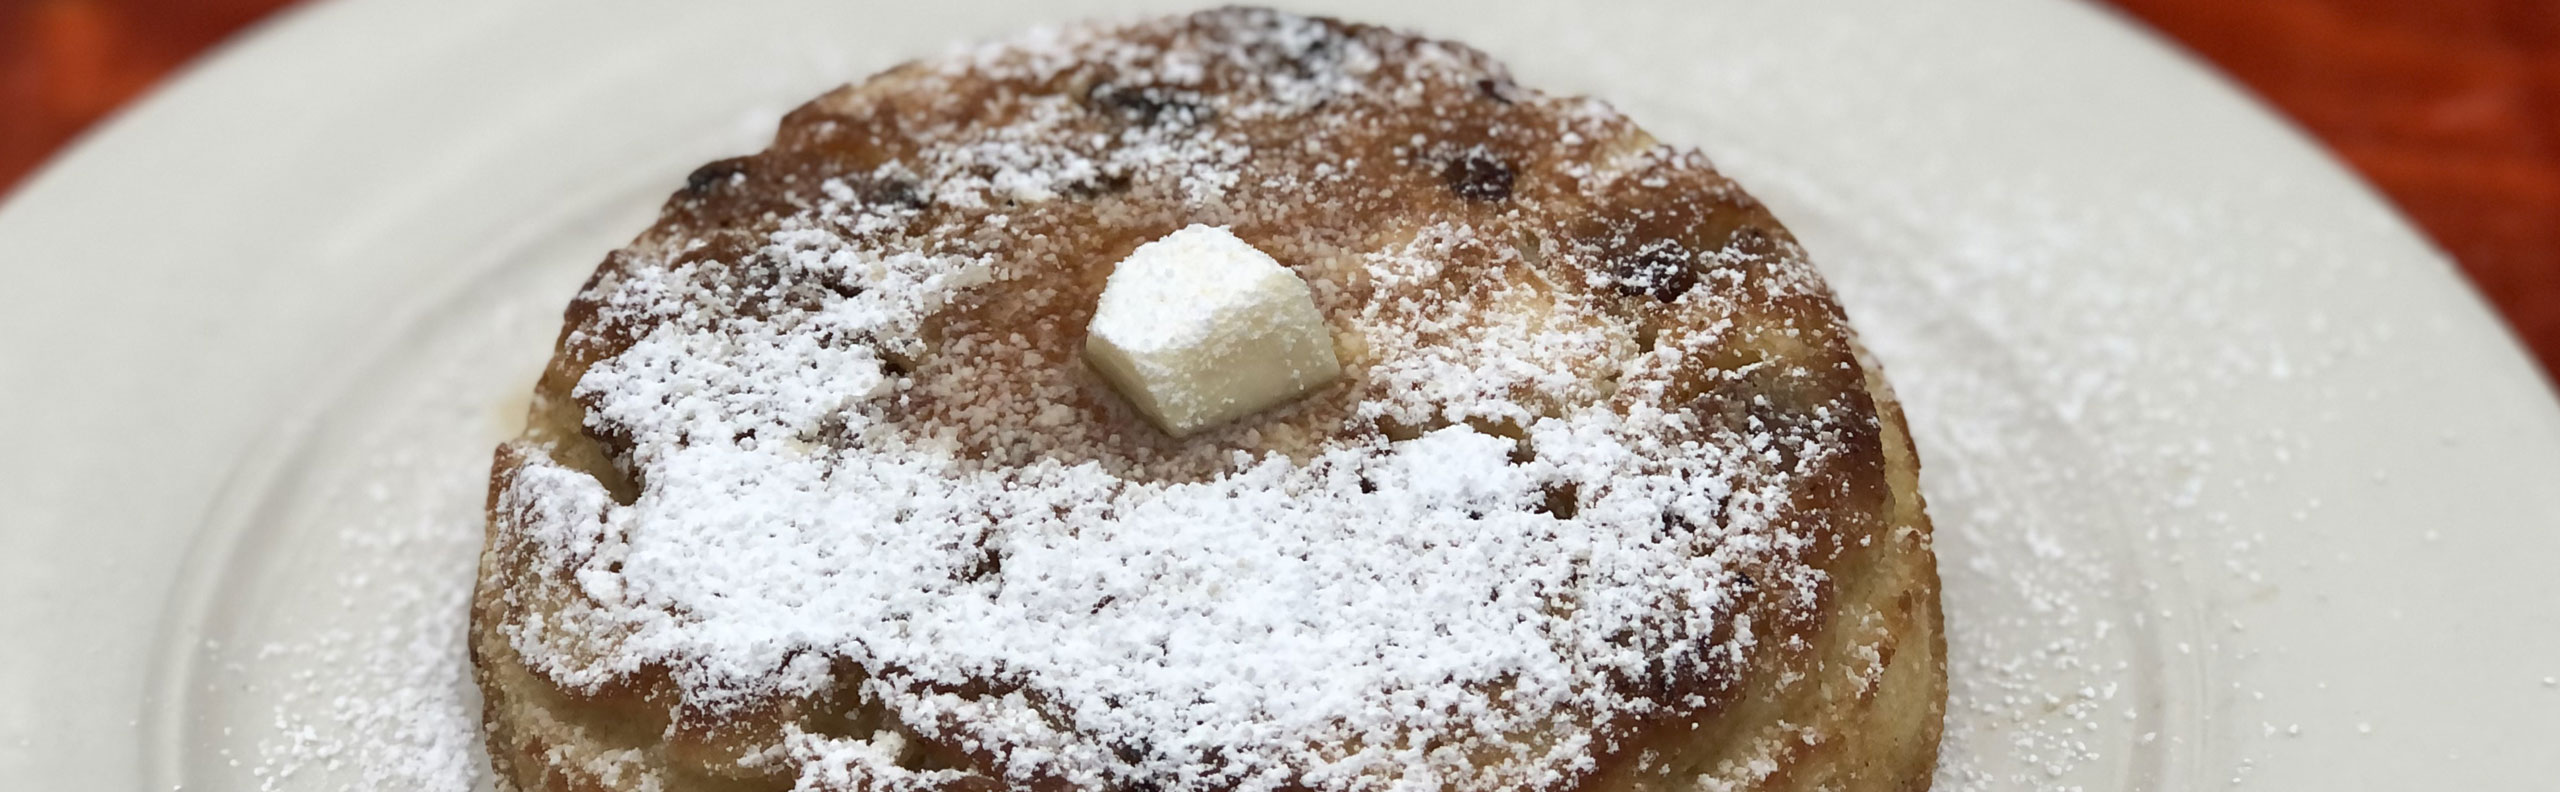 Amelia's Amazing Stuffed Pancake